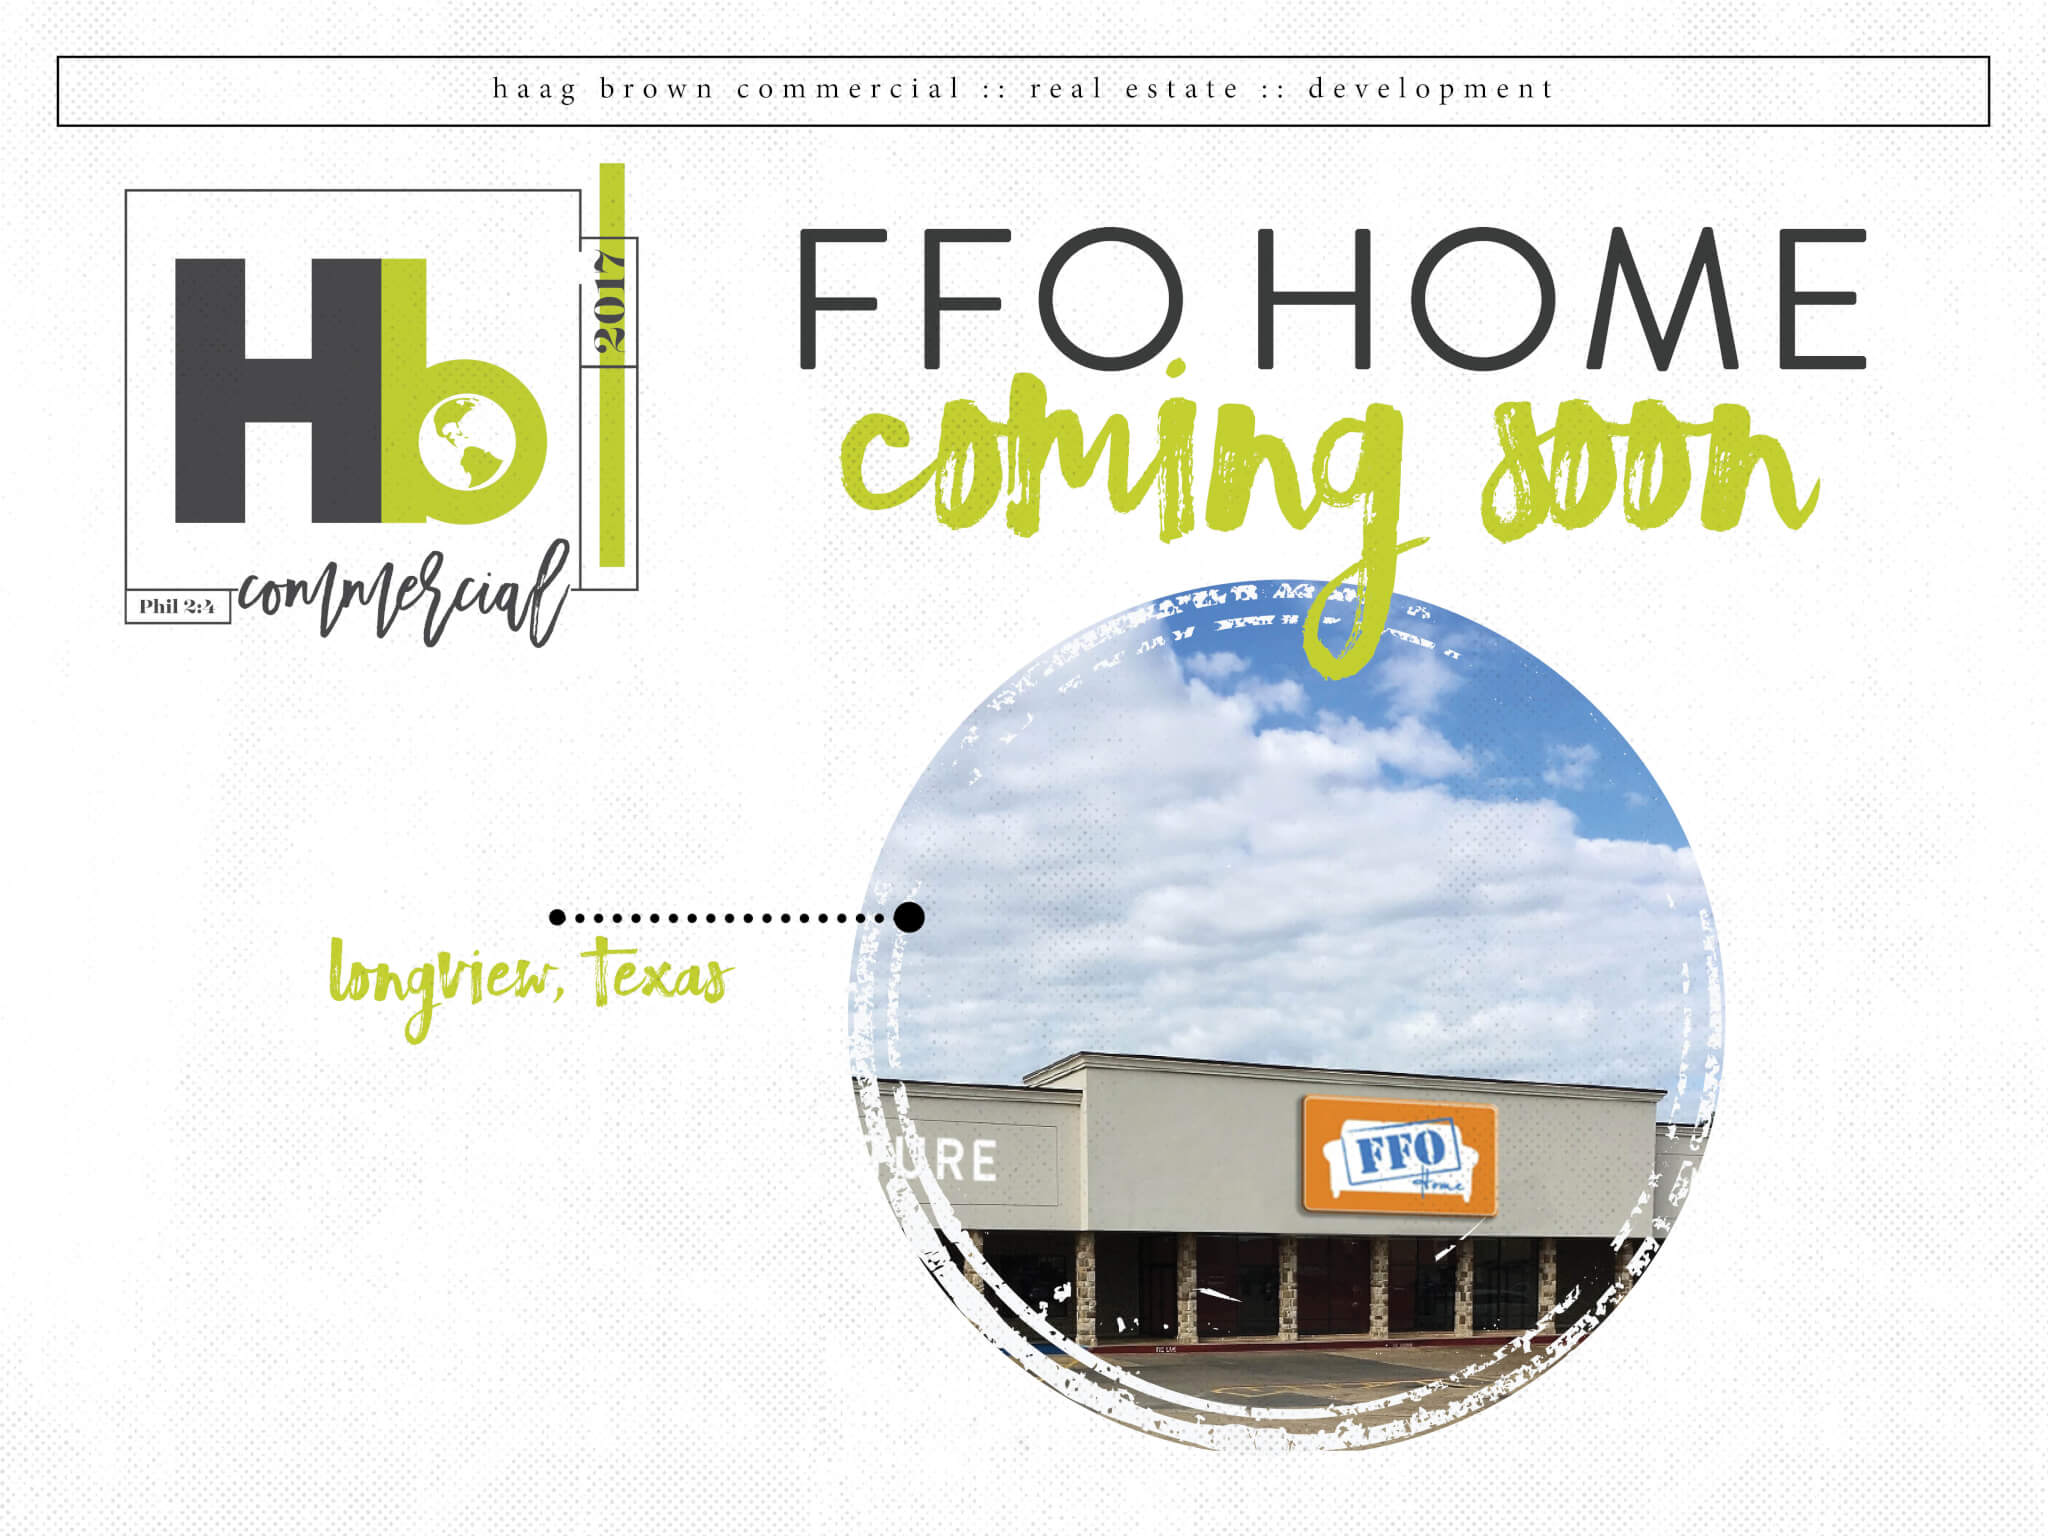 FFO Home Coming to Longview, Texas